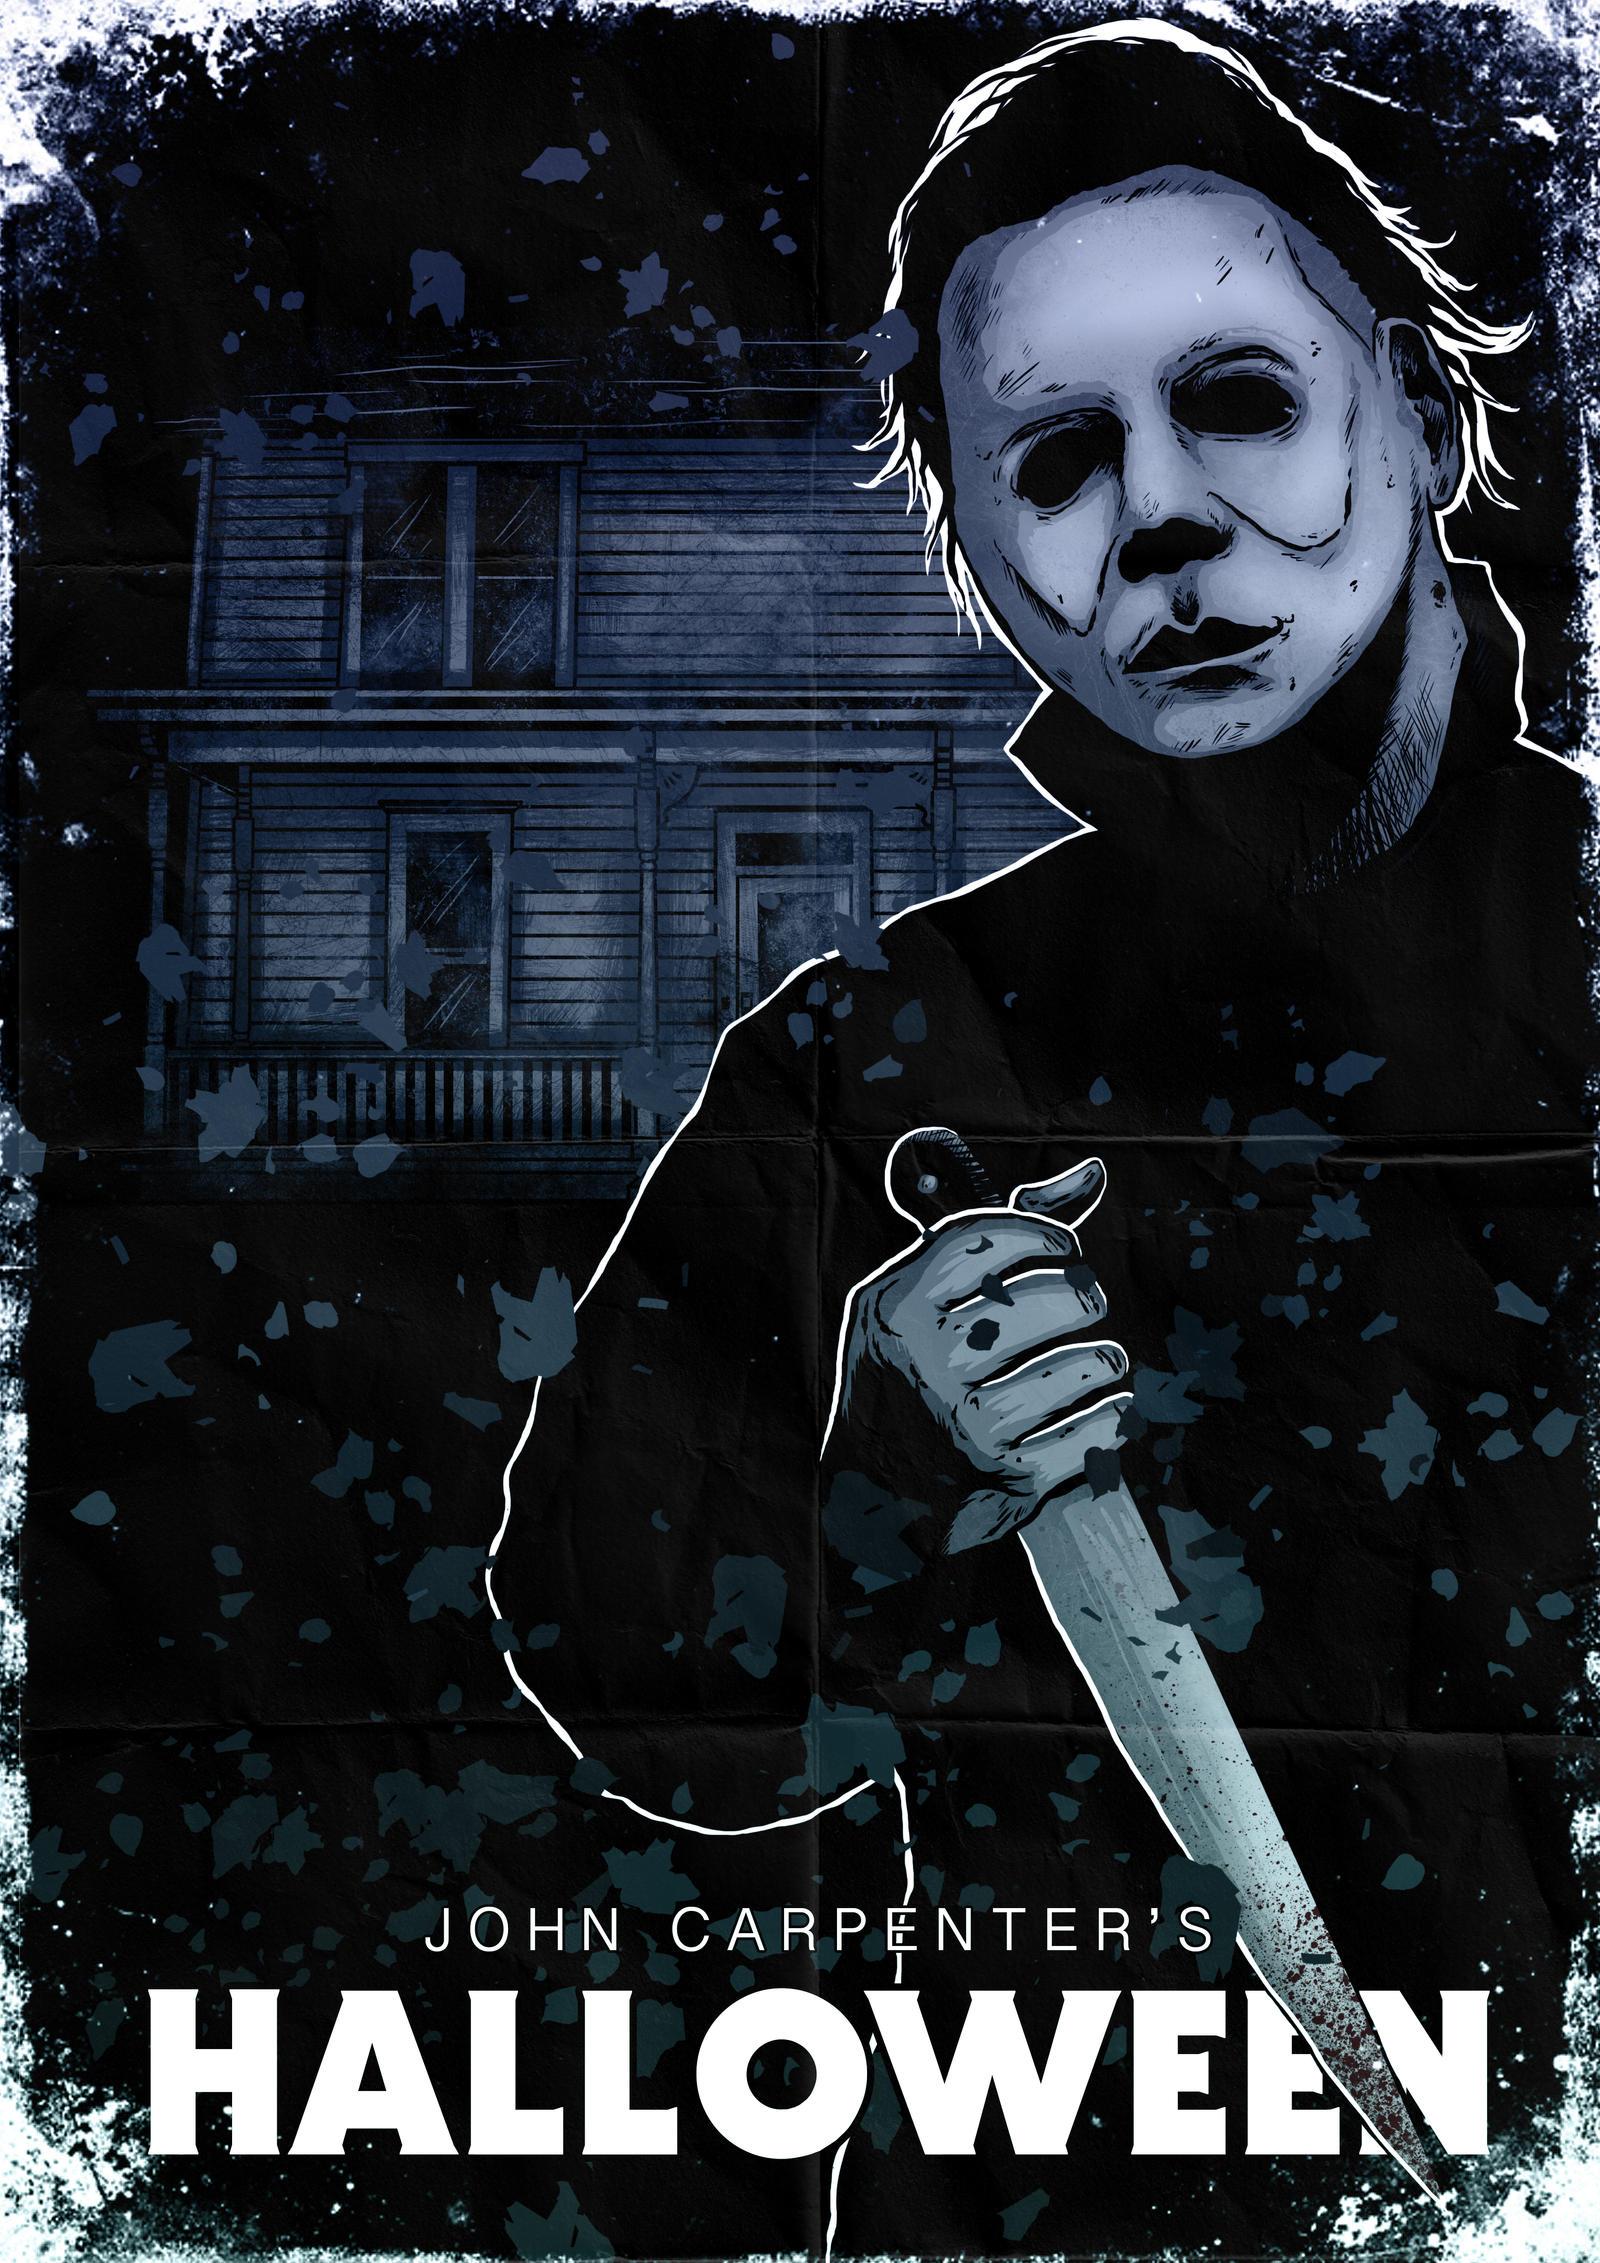 Michael Myers Halloween Poster By Liquid Venom